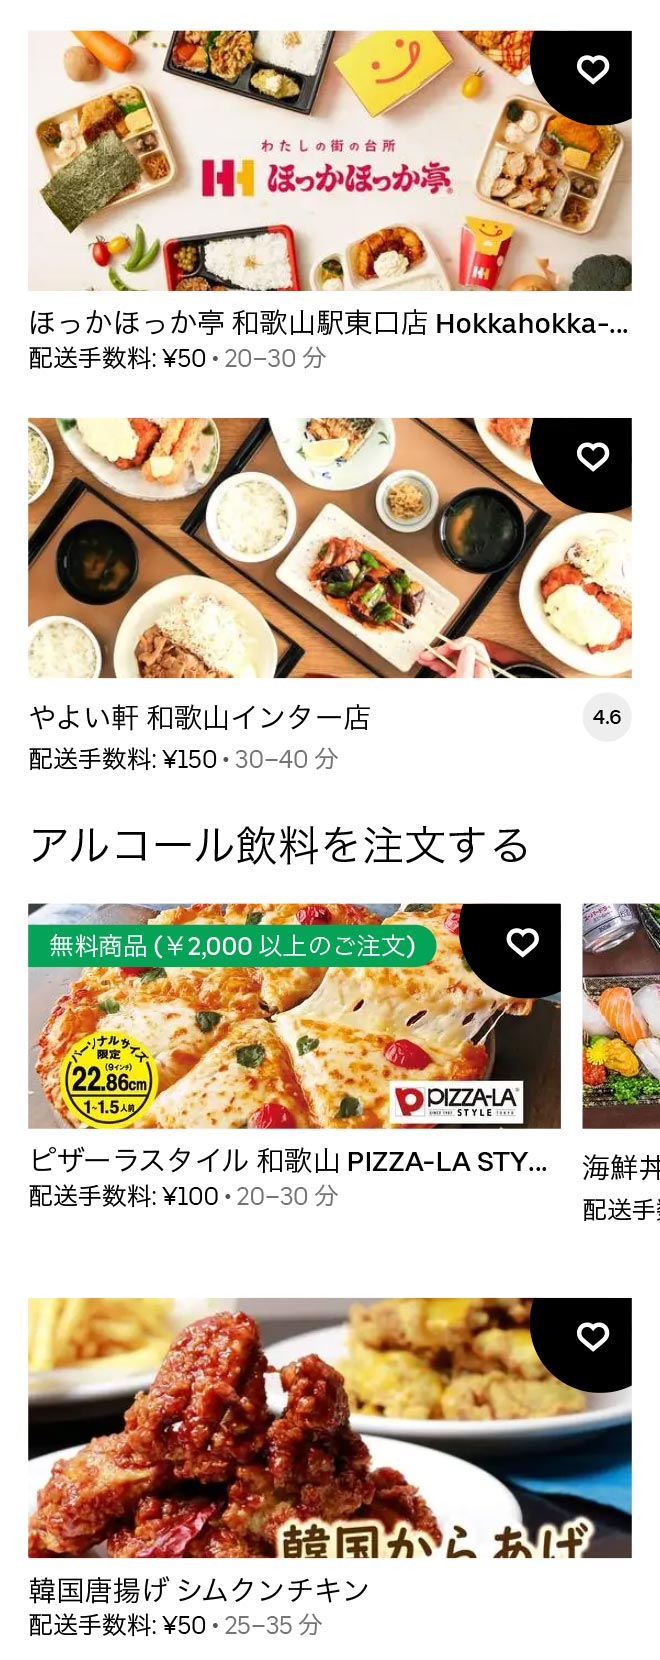 U wakayama menu 2104 11